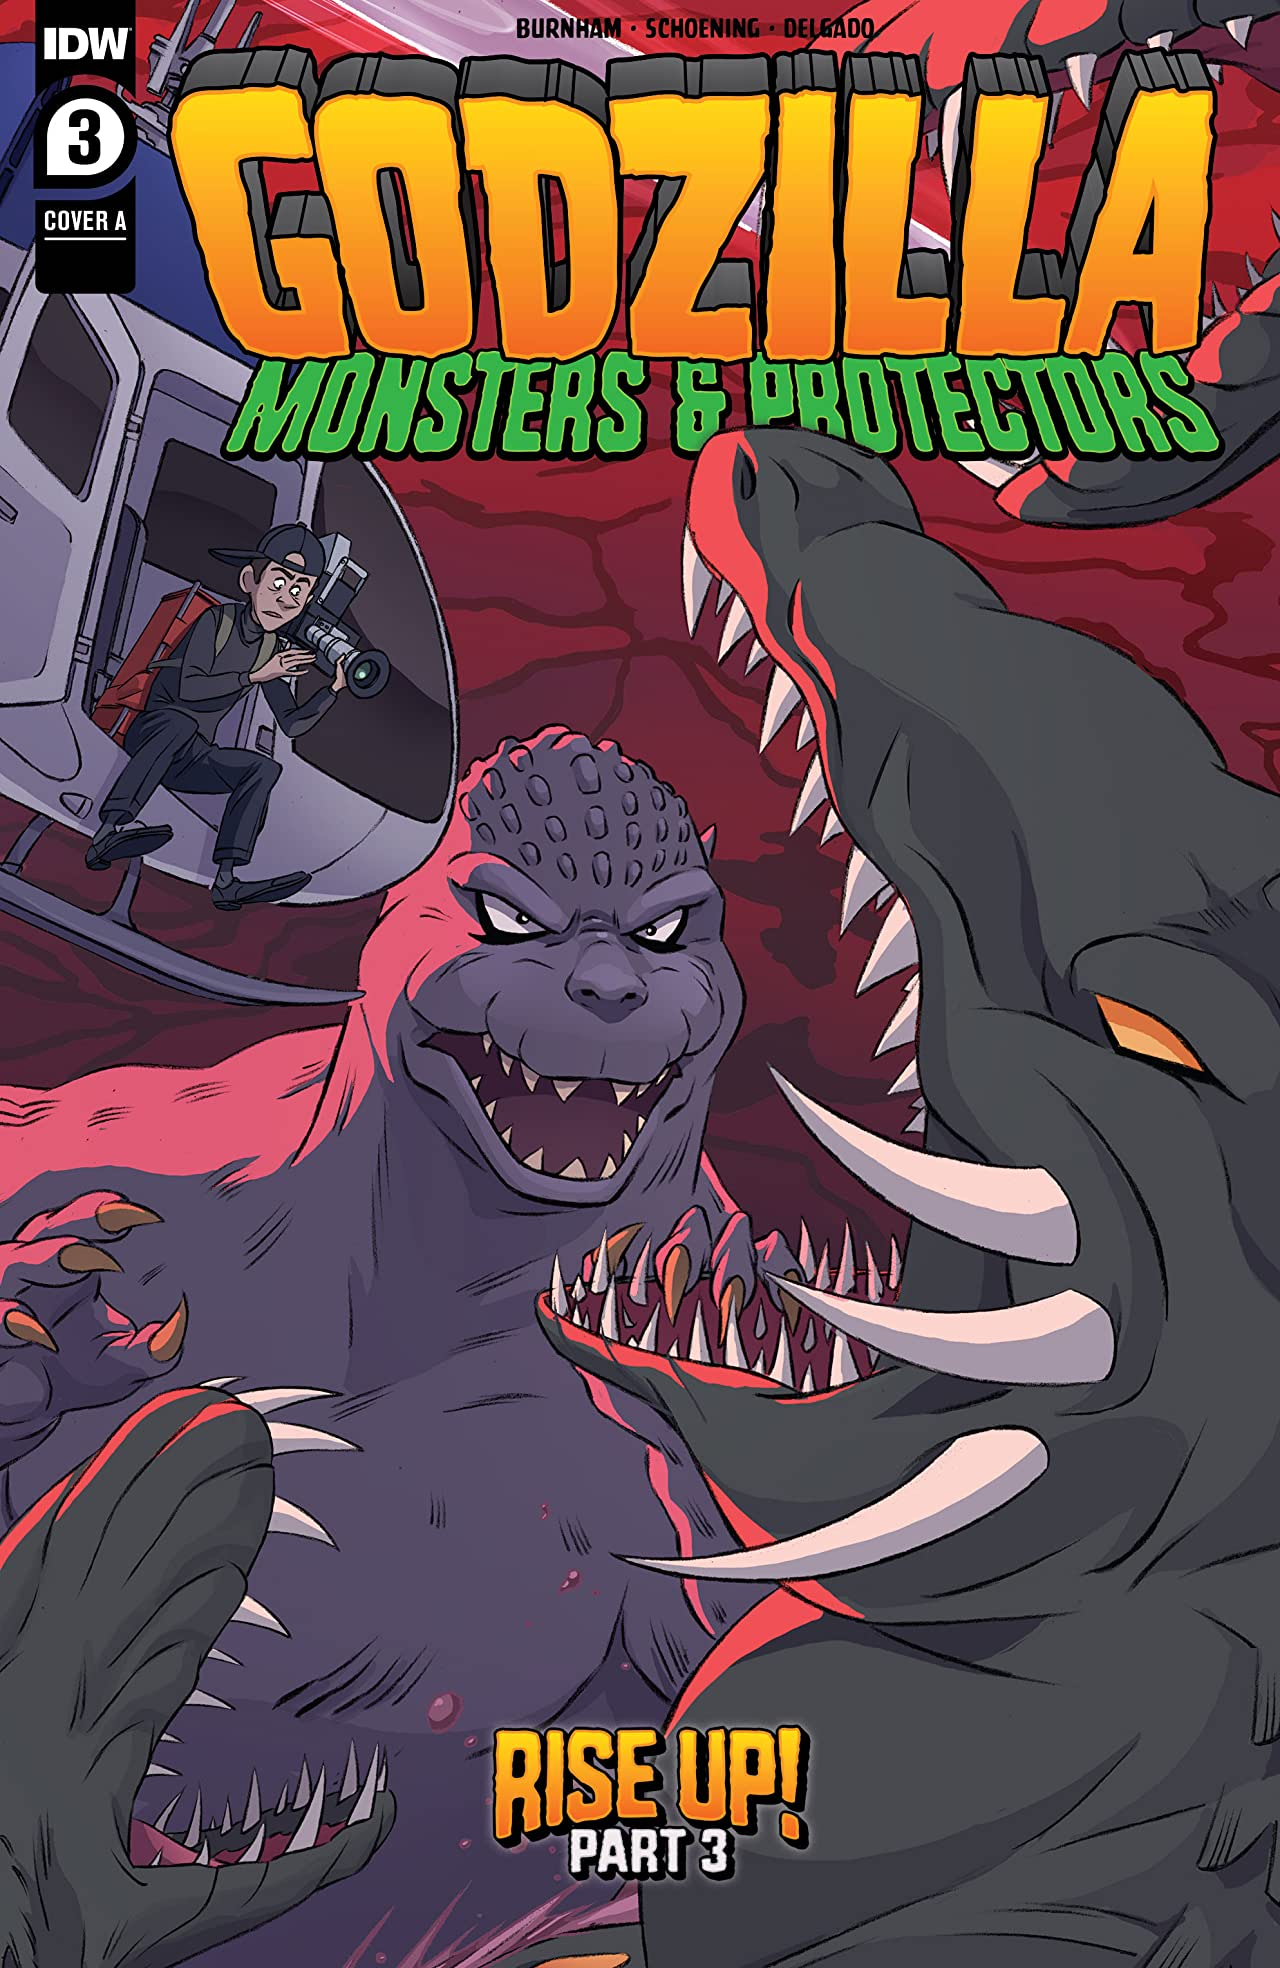 Godzilla: Monsters & Protectors #3